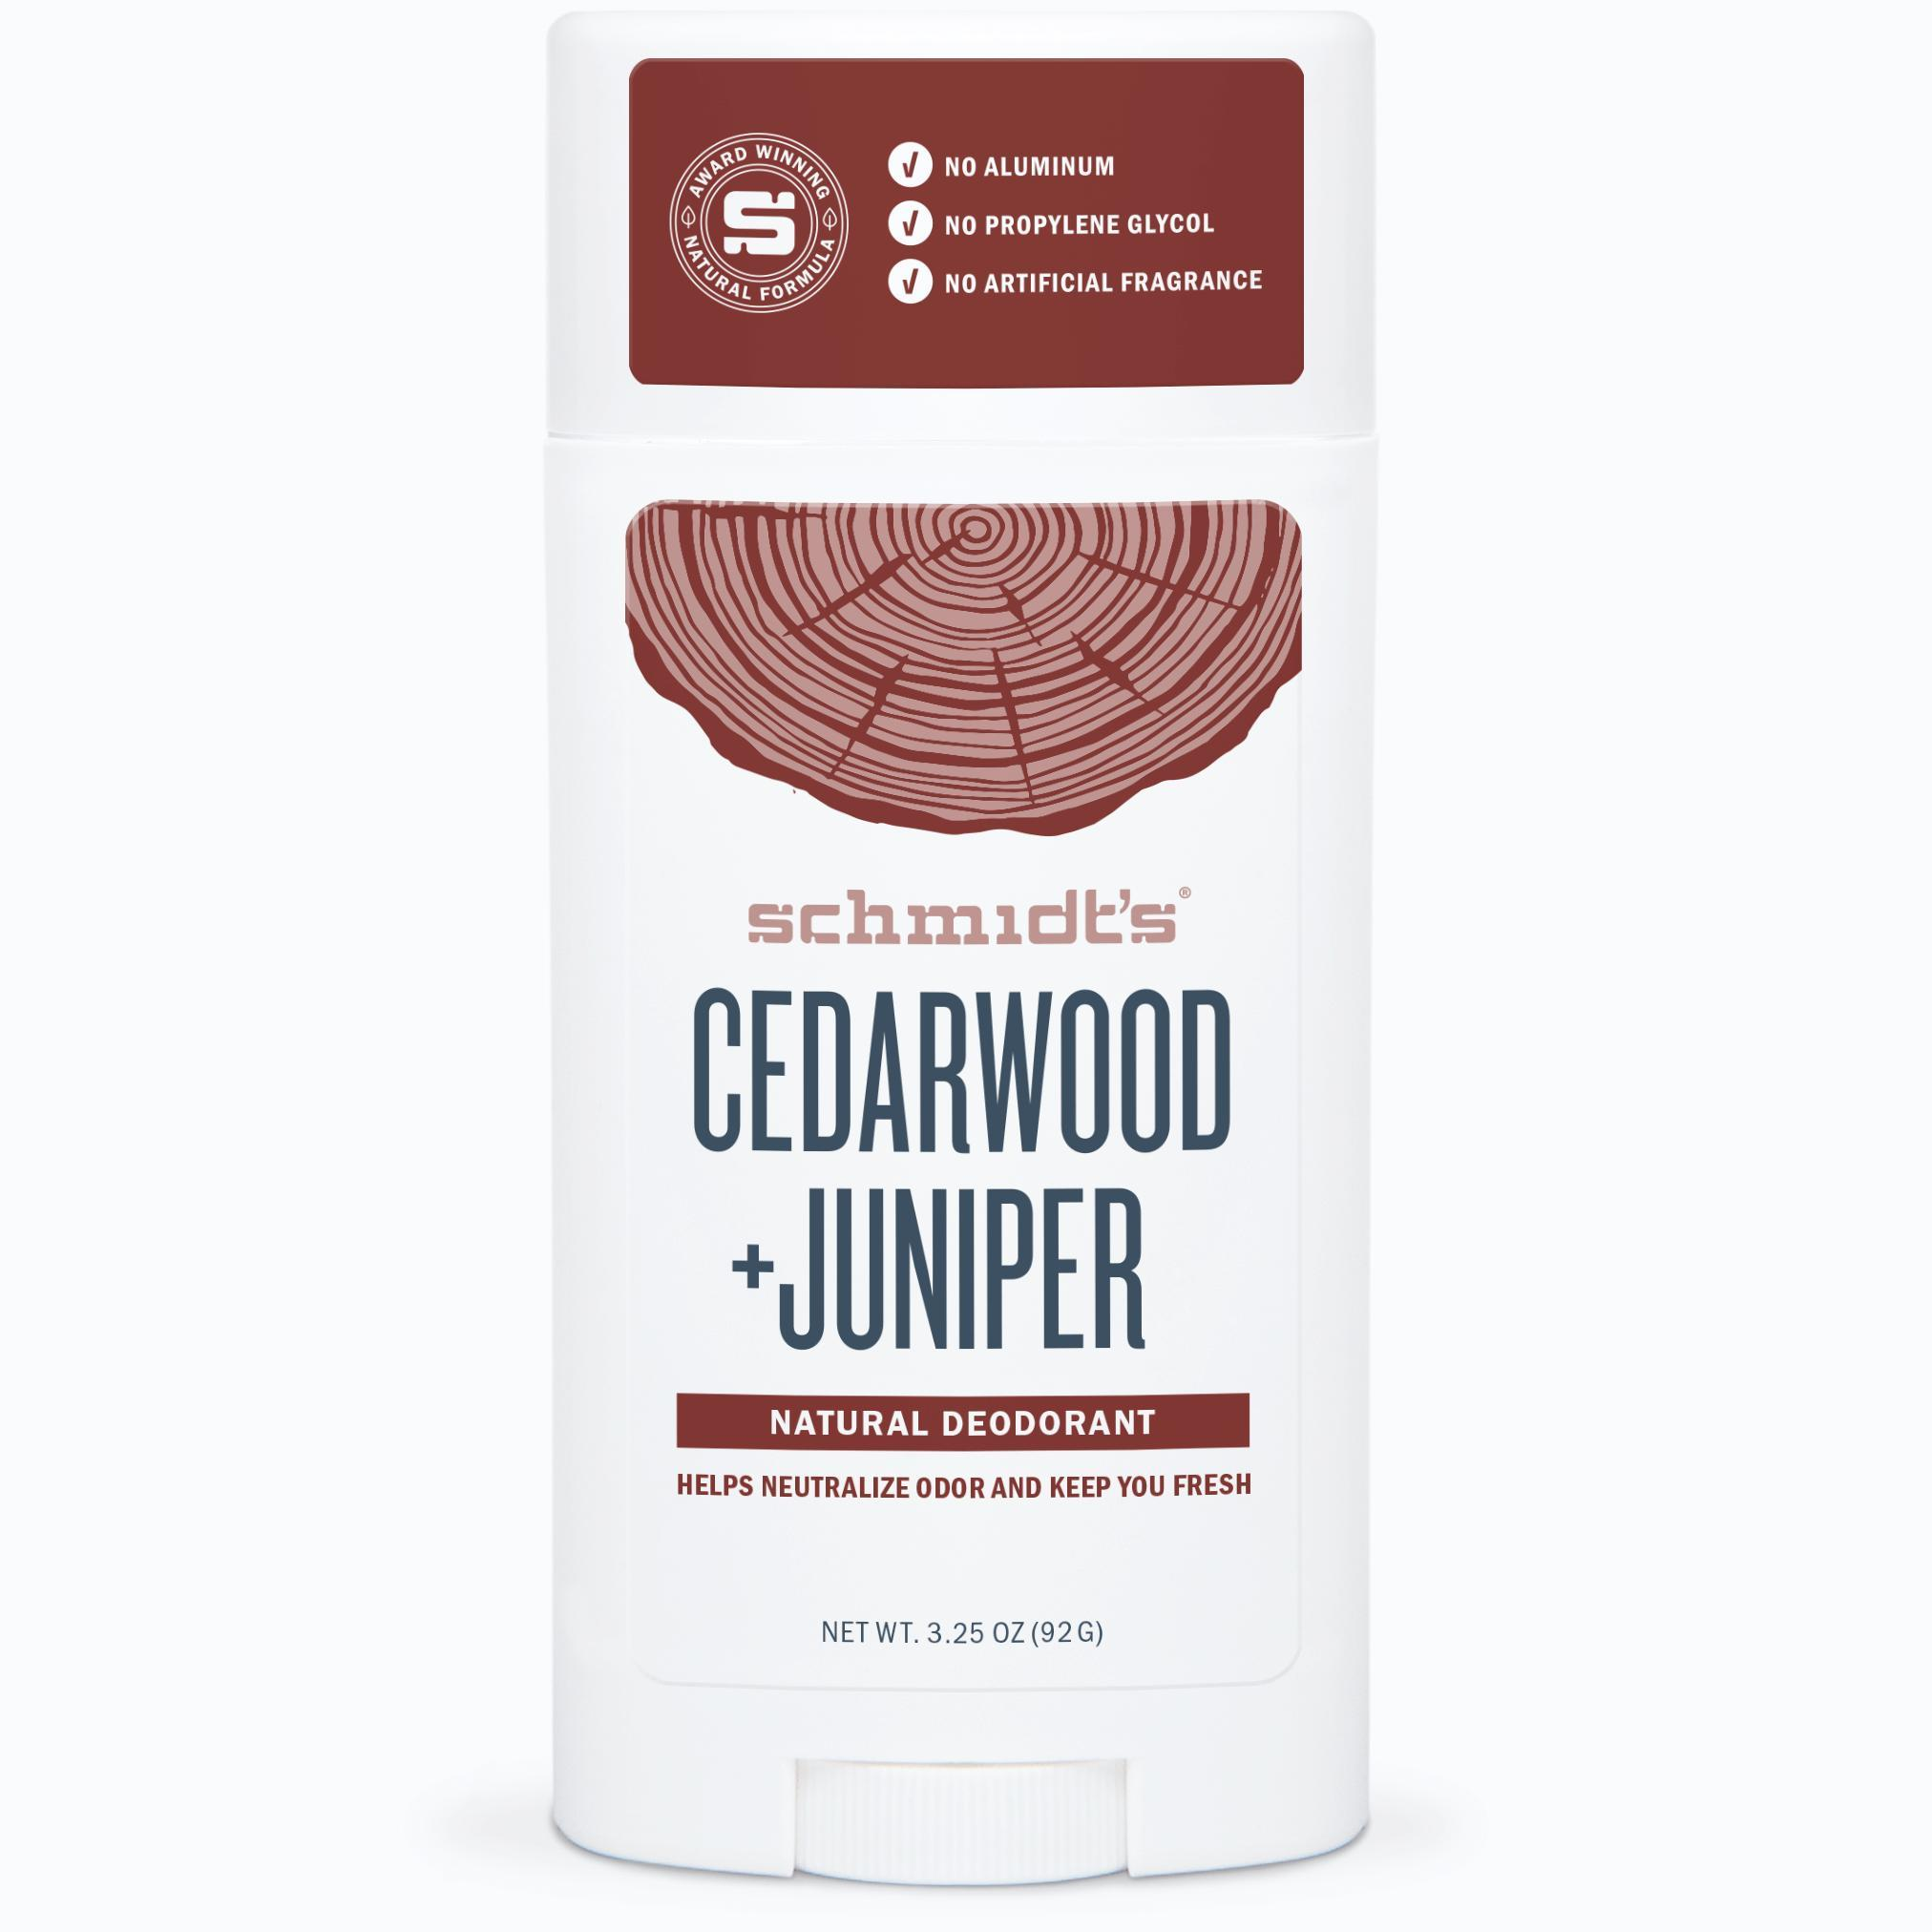 Cedarwood + Juniper Deodorant Stick